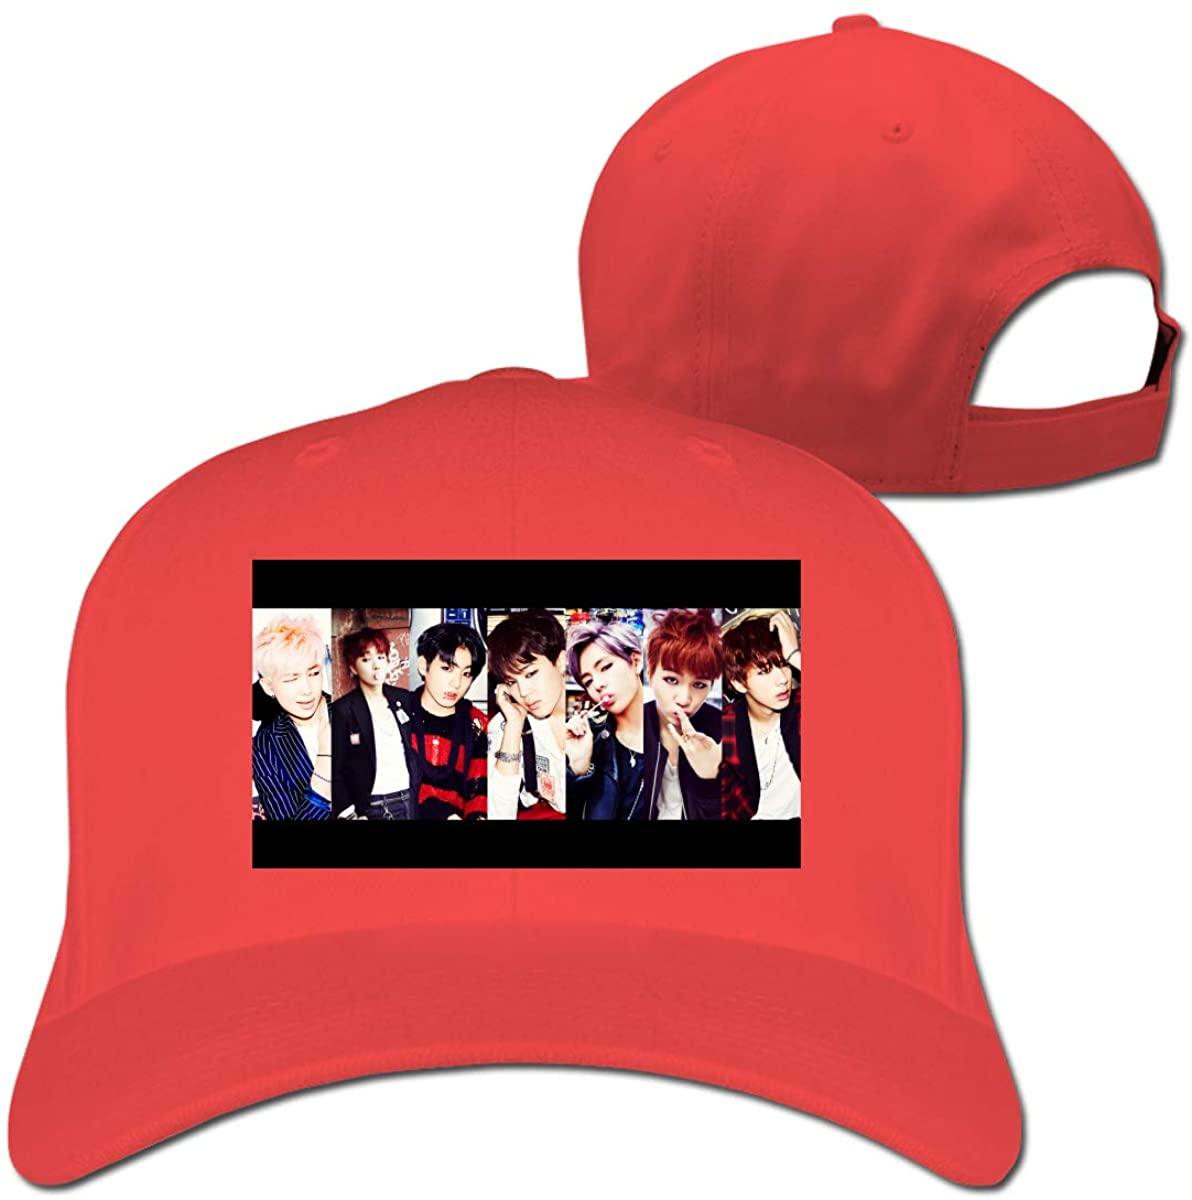 Kpop BTS Casquette Hip Hop Hat Outdoor Baseball Cap Classic Adjustable Unisex